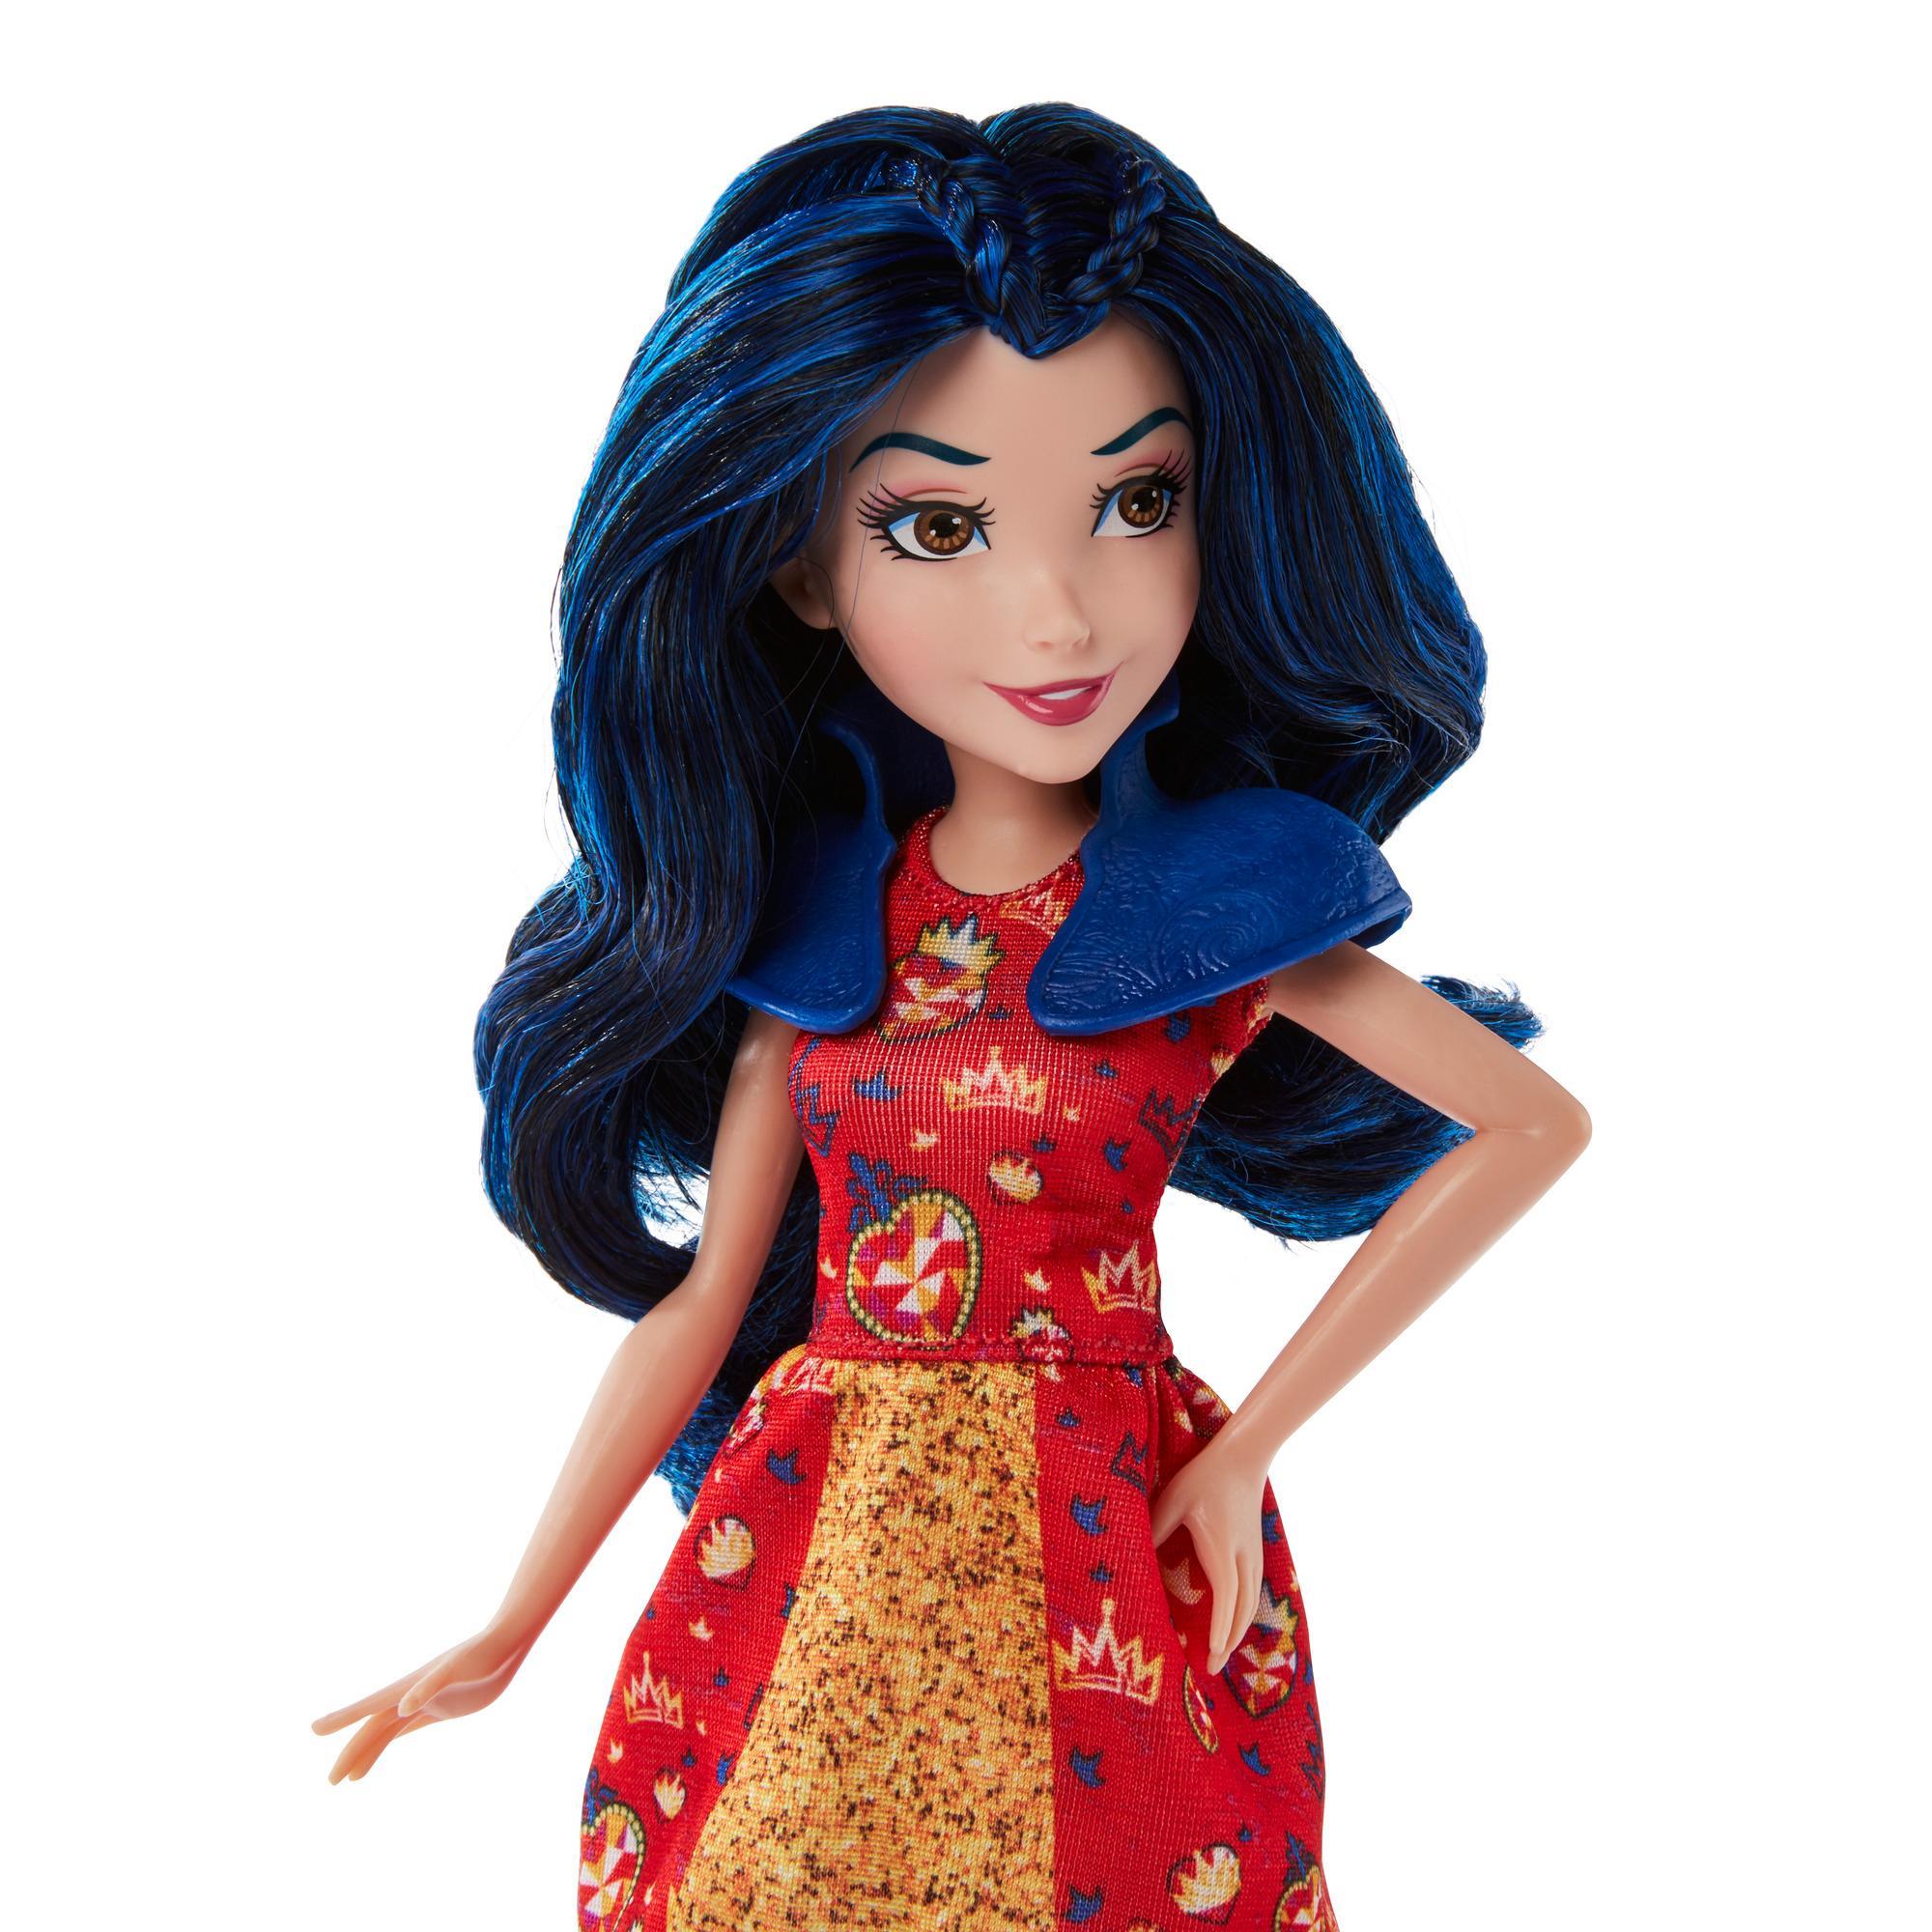 Amazon De: Amazon.com: Disney Descendants Fashion Evie Of Isle Of The